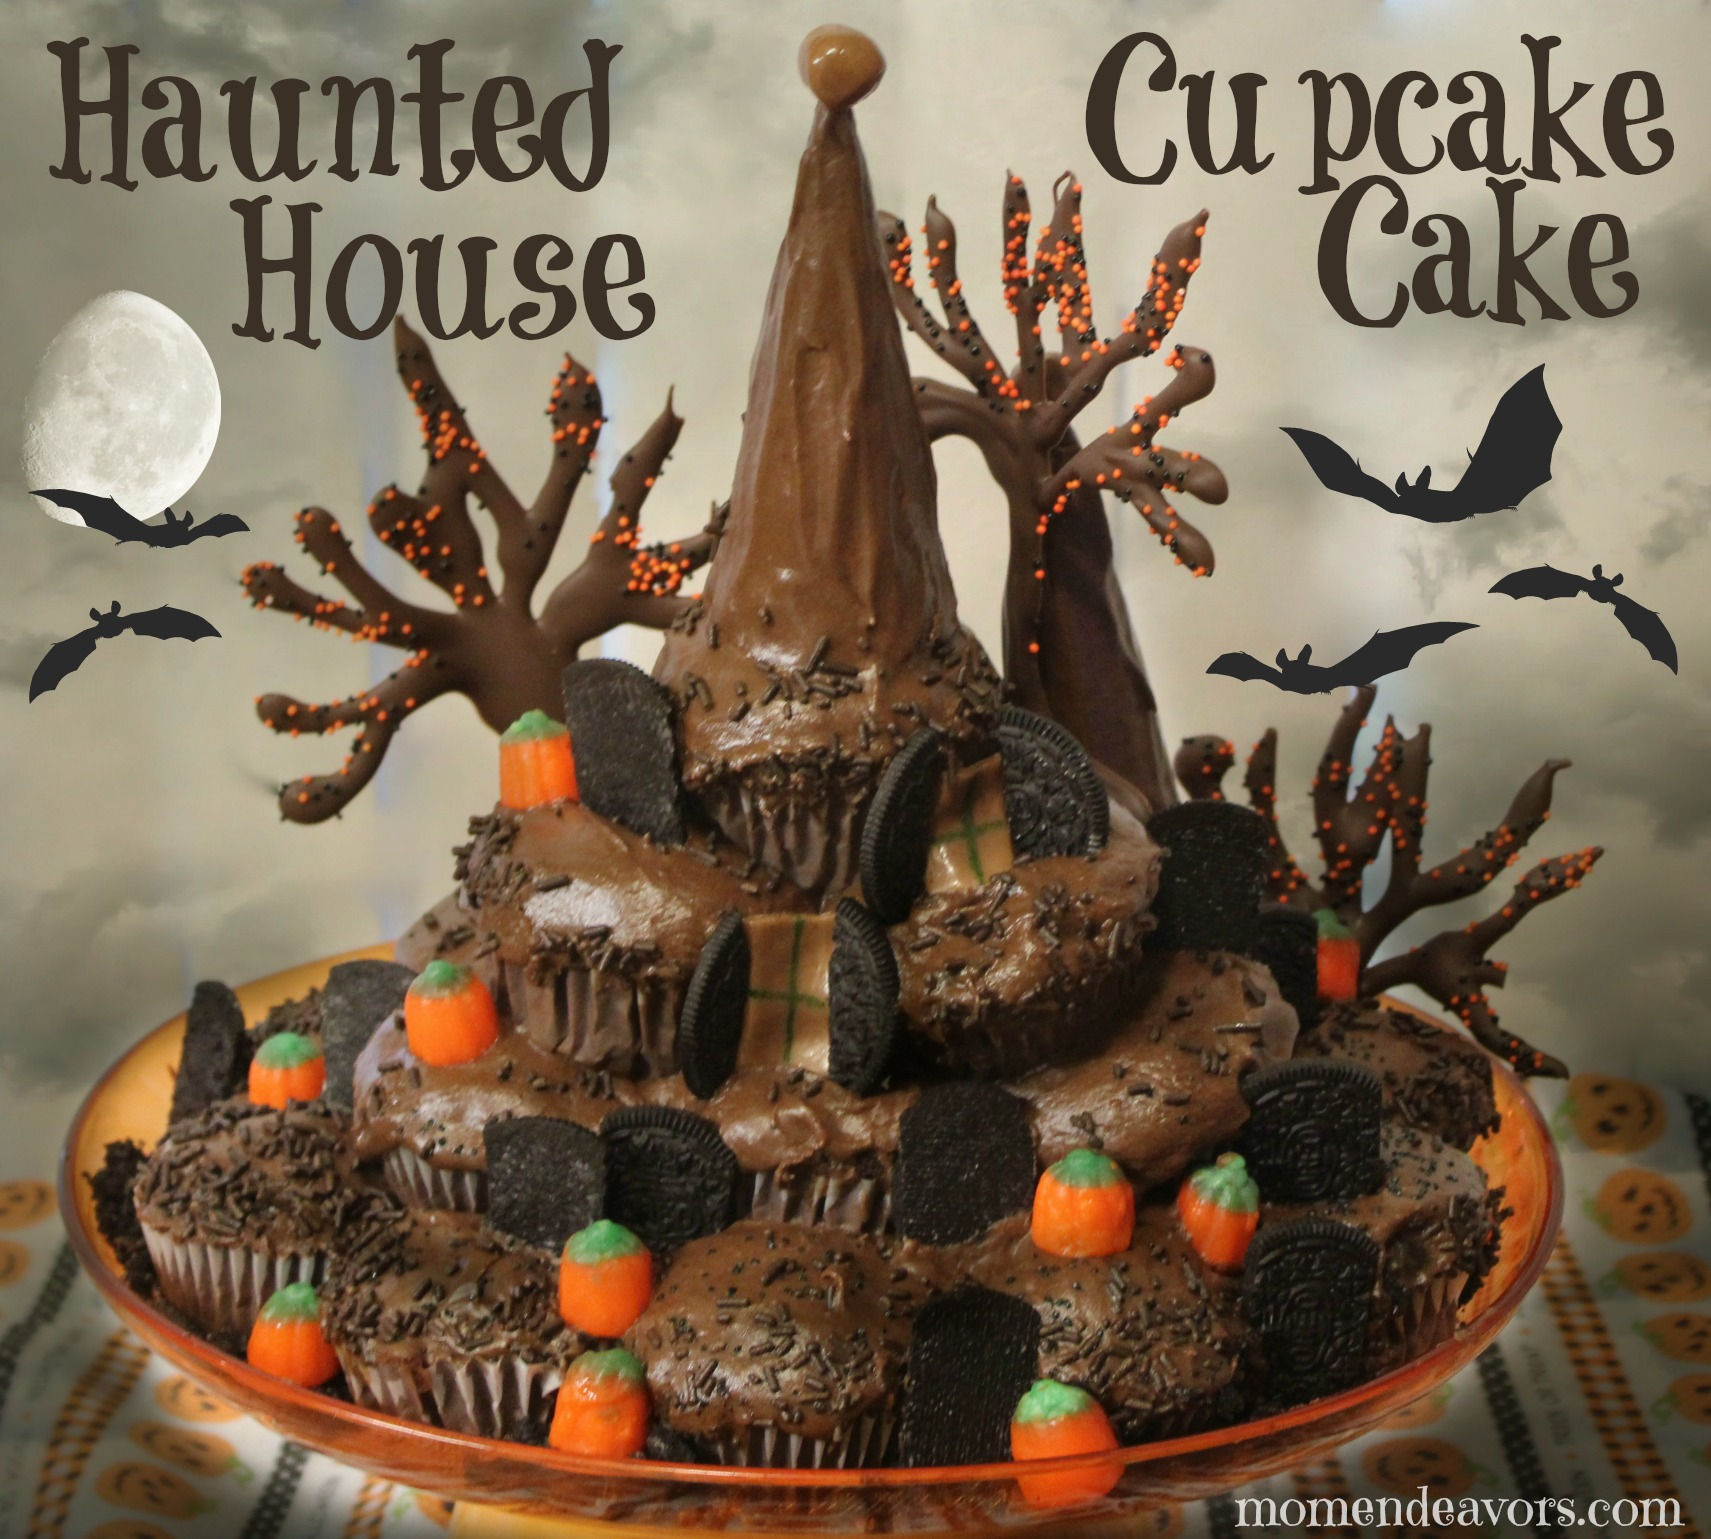 Haunted House Cupcake Cake